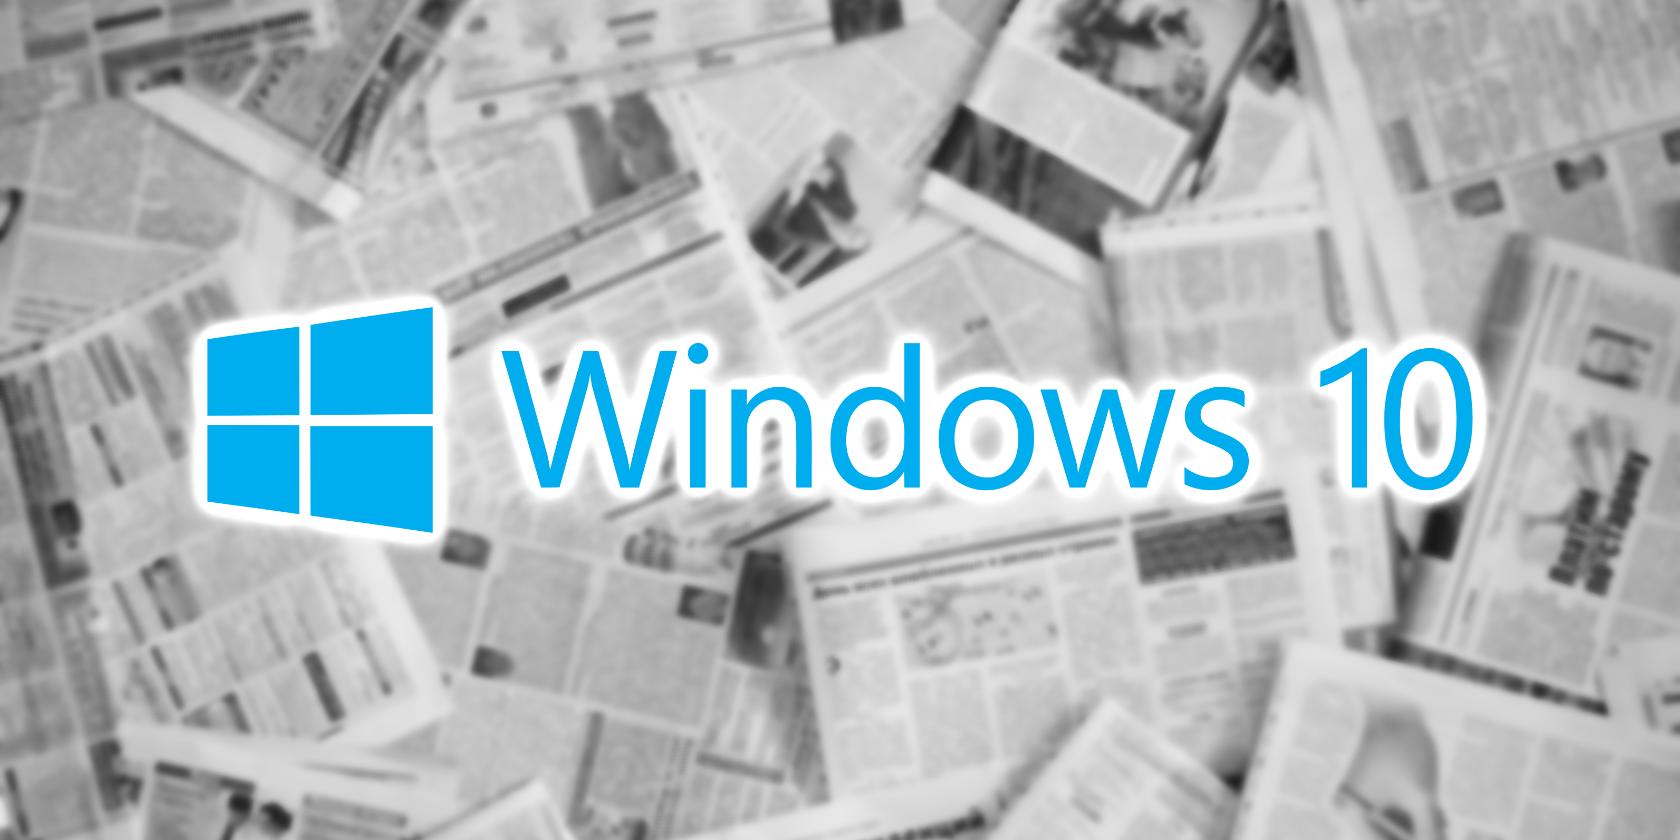 Microsoft Brings News and Interests to Every Windows 10 Users Taskbar